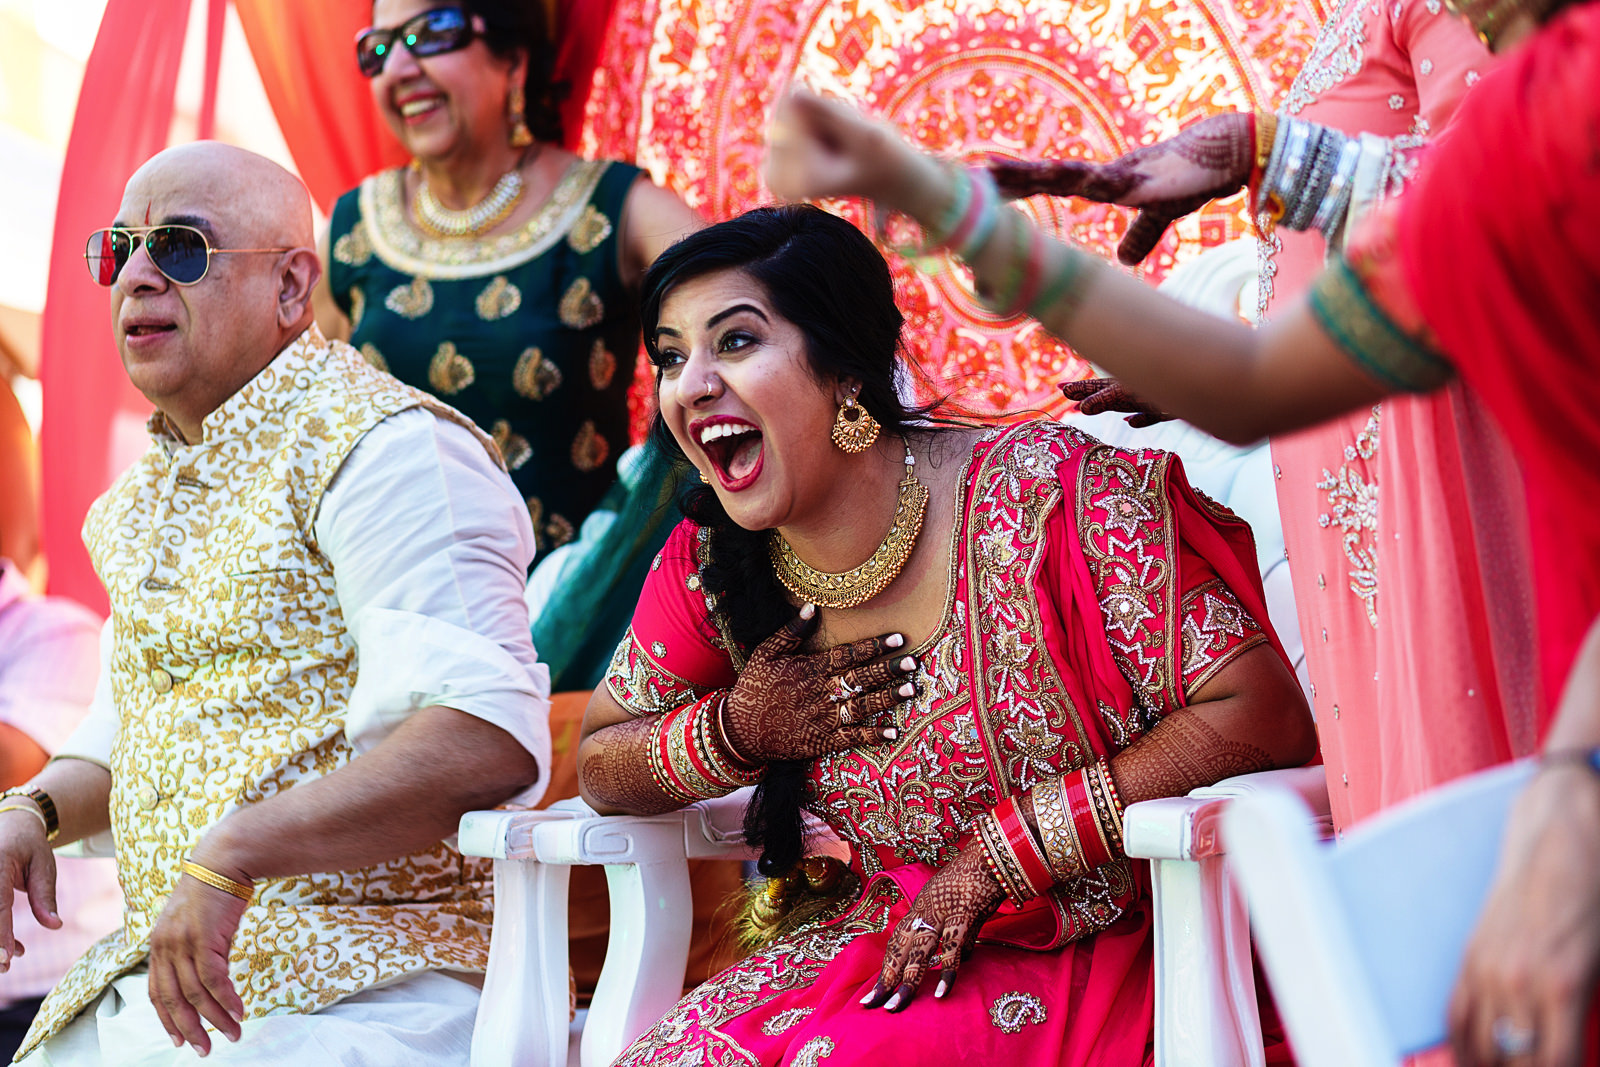 Reaction of bride while seeing groom performing